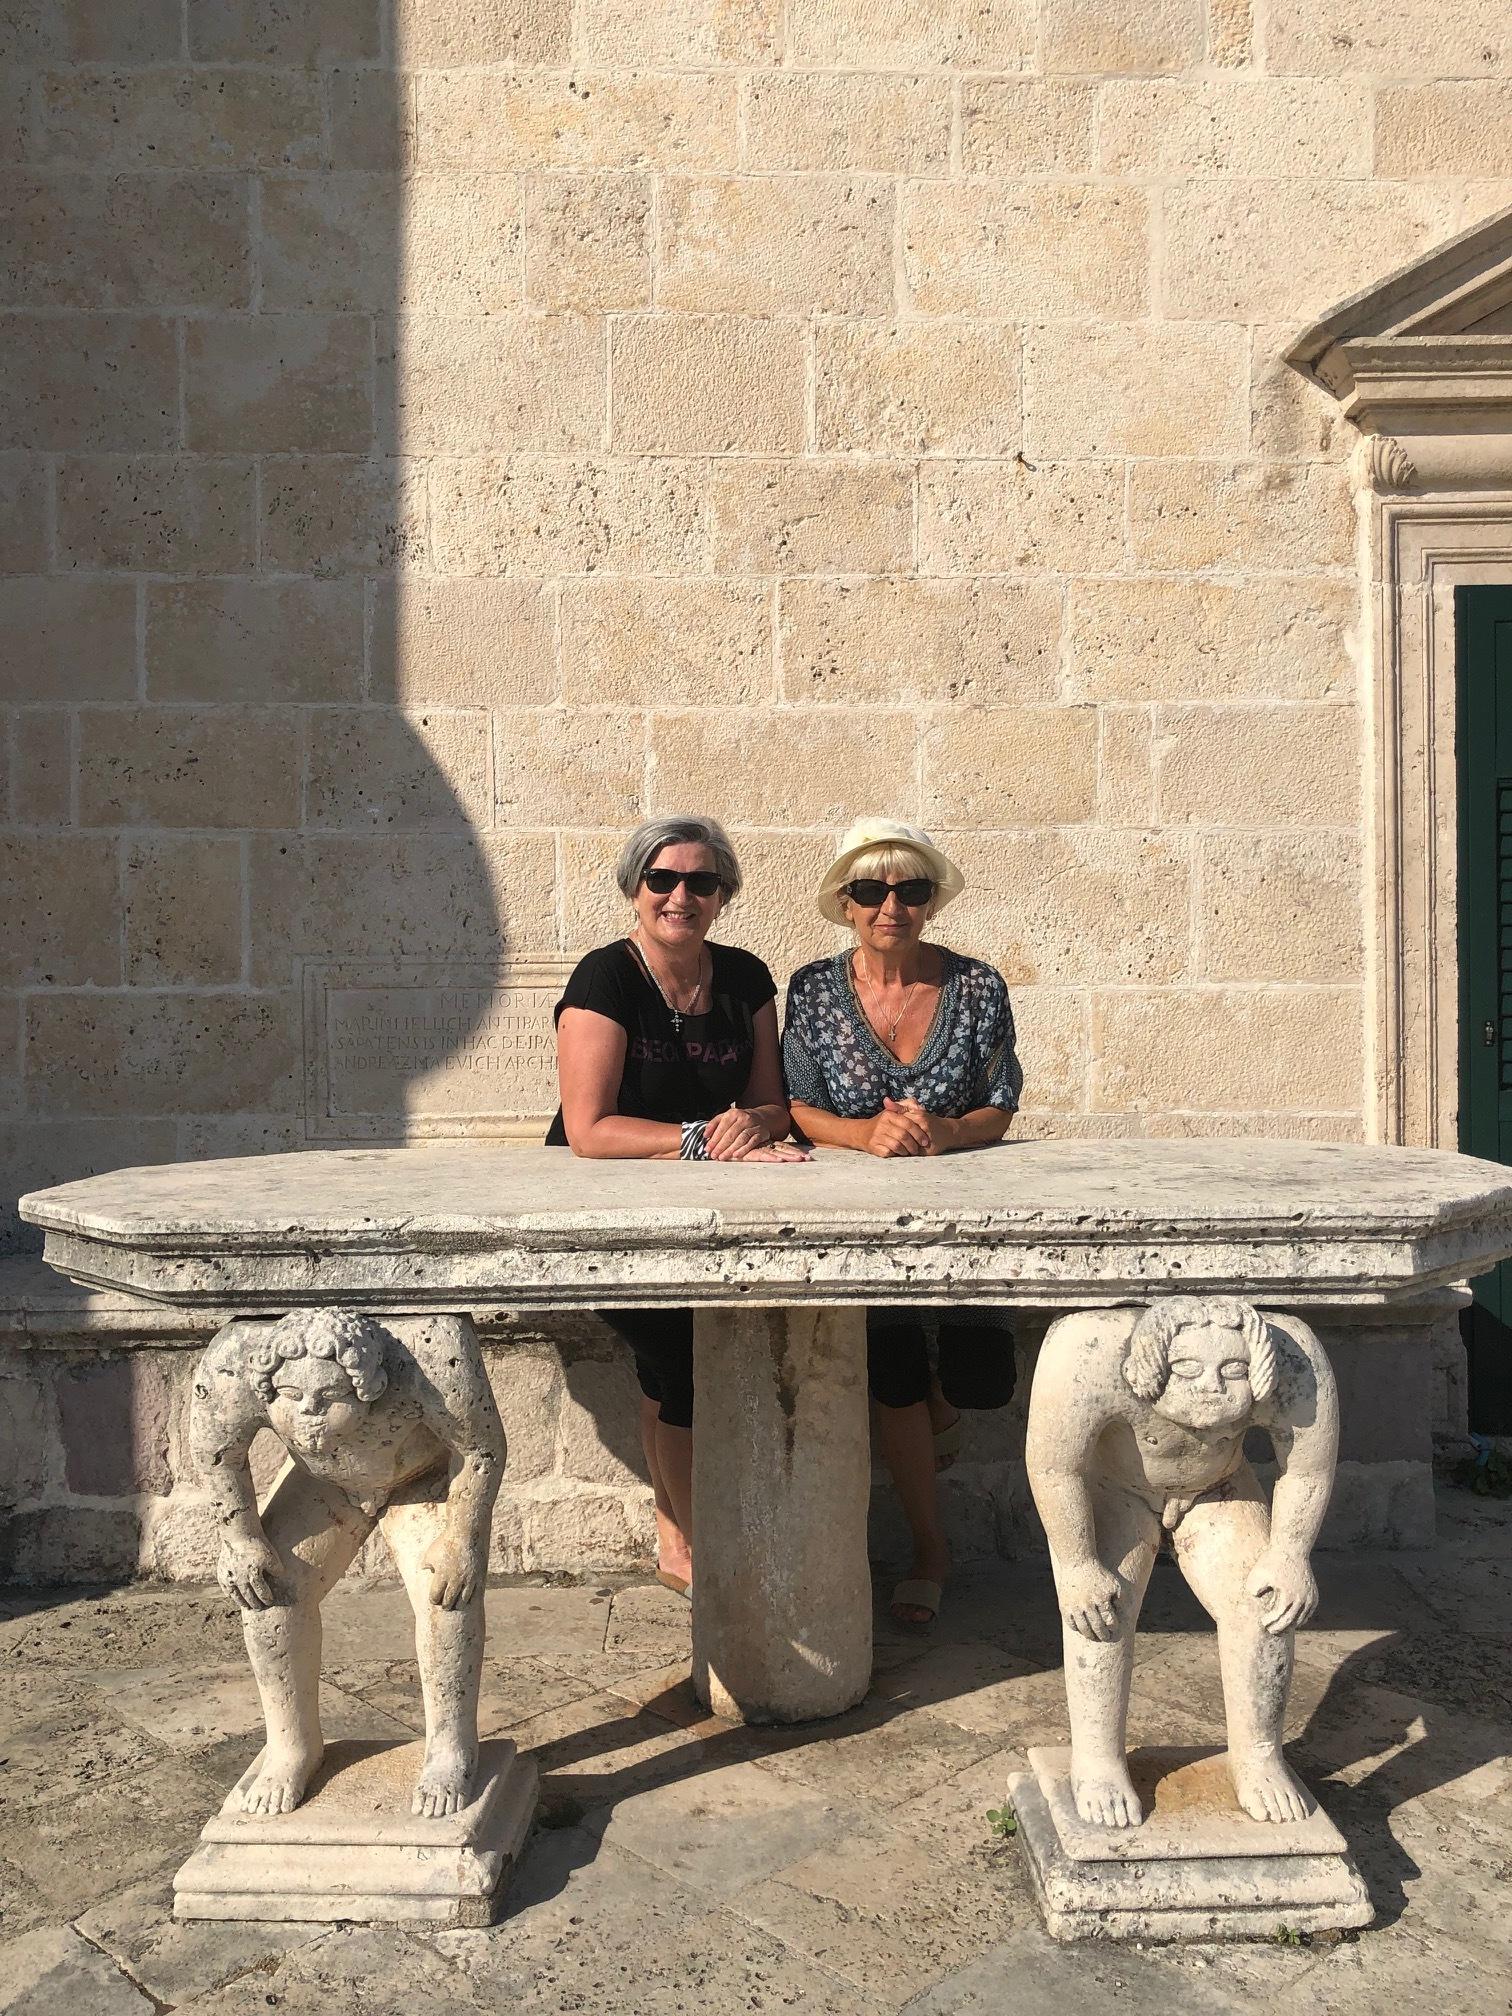 With my friend Danka (at right), visiting Gospa od škrpjela, Boka Kotor, Montenegro